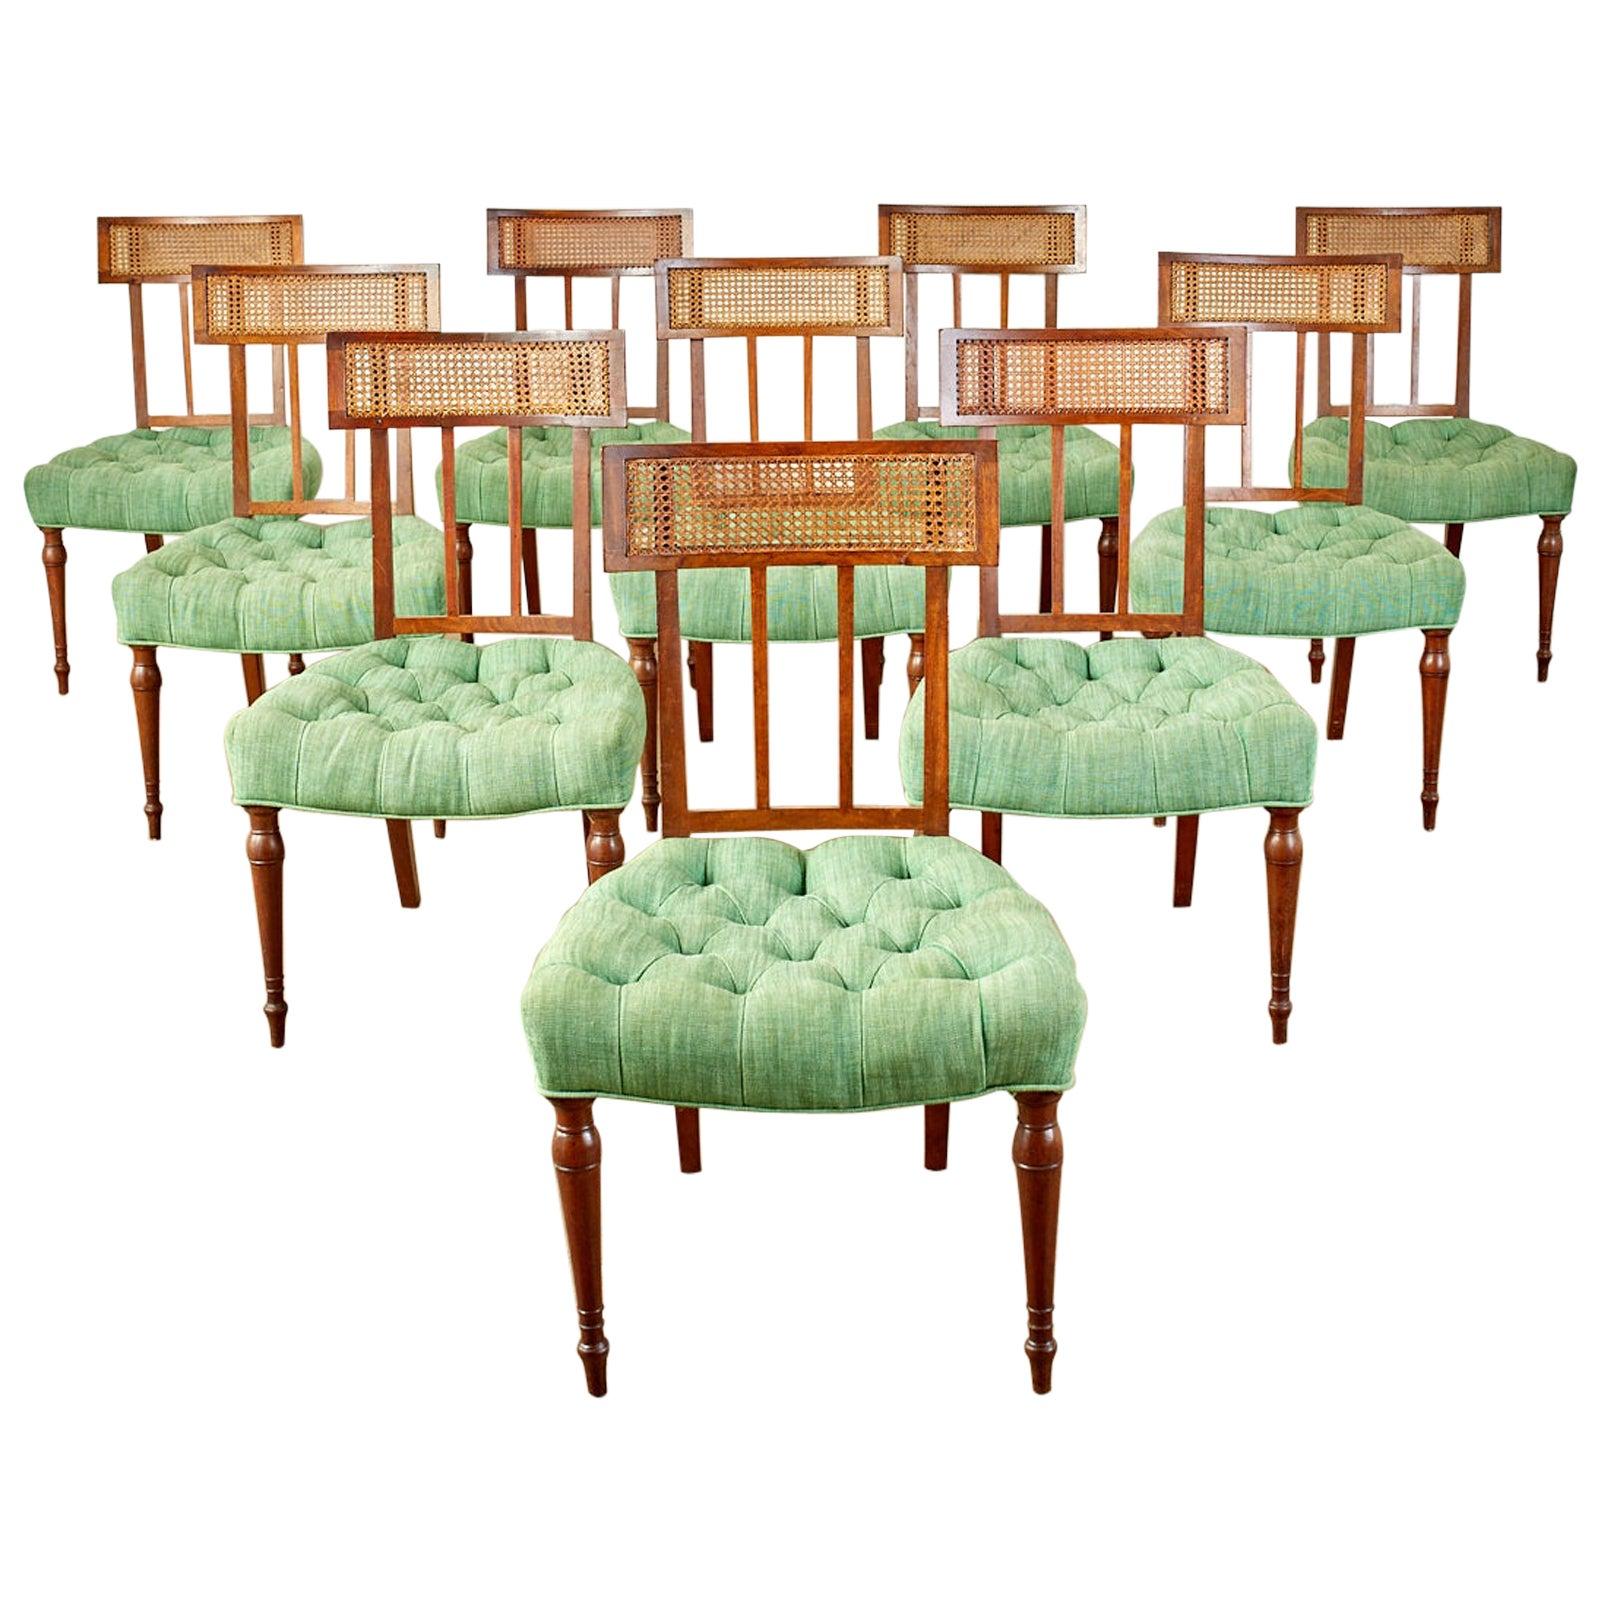 Set of Ten English Regency Mahogany Caned Dining Chairs